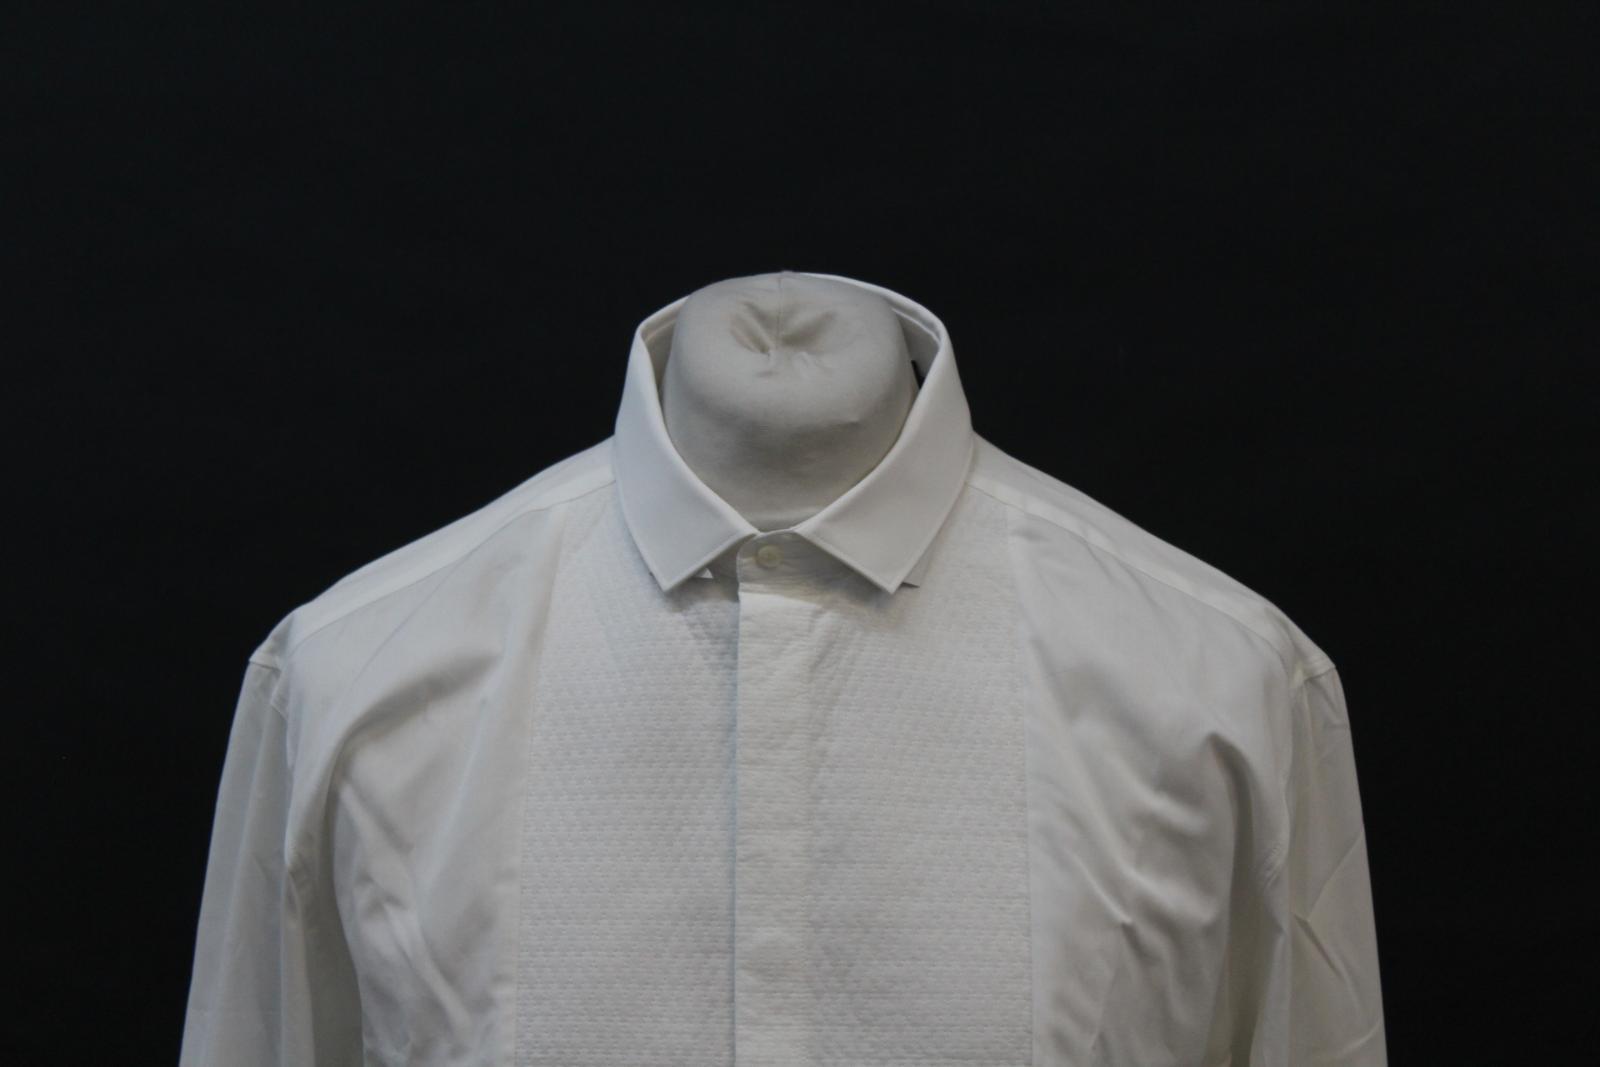 Neil-Barrett-Hombre-Blanco-De-Algodon-Manga-Larga-Camiseta-Formal-Cuello-17-034-43cm-BNWT miniatura 3